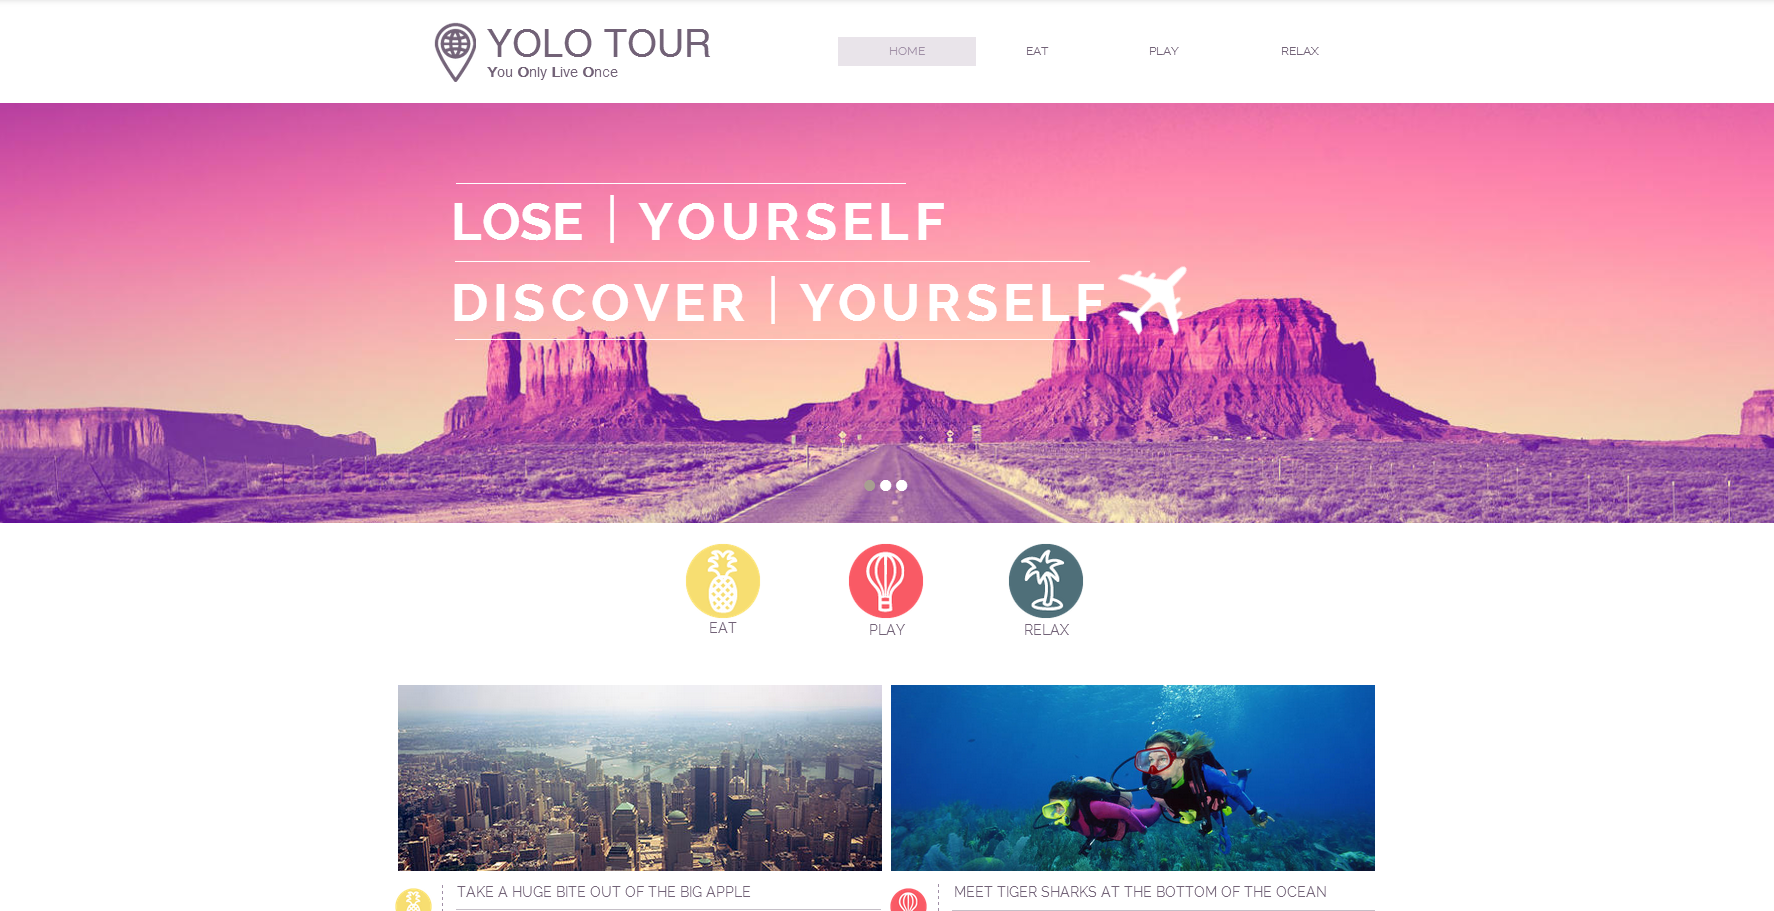 Yolo tour